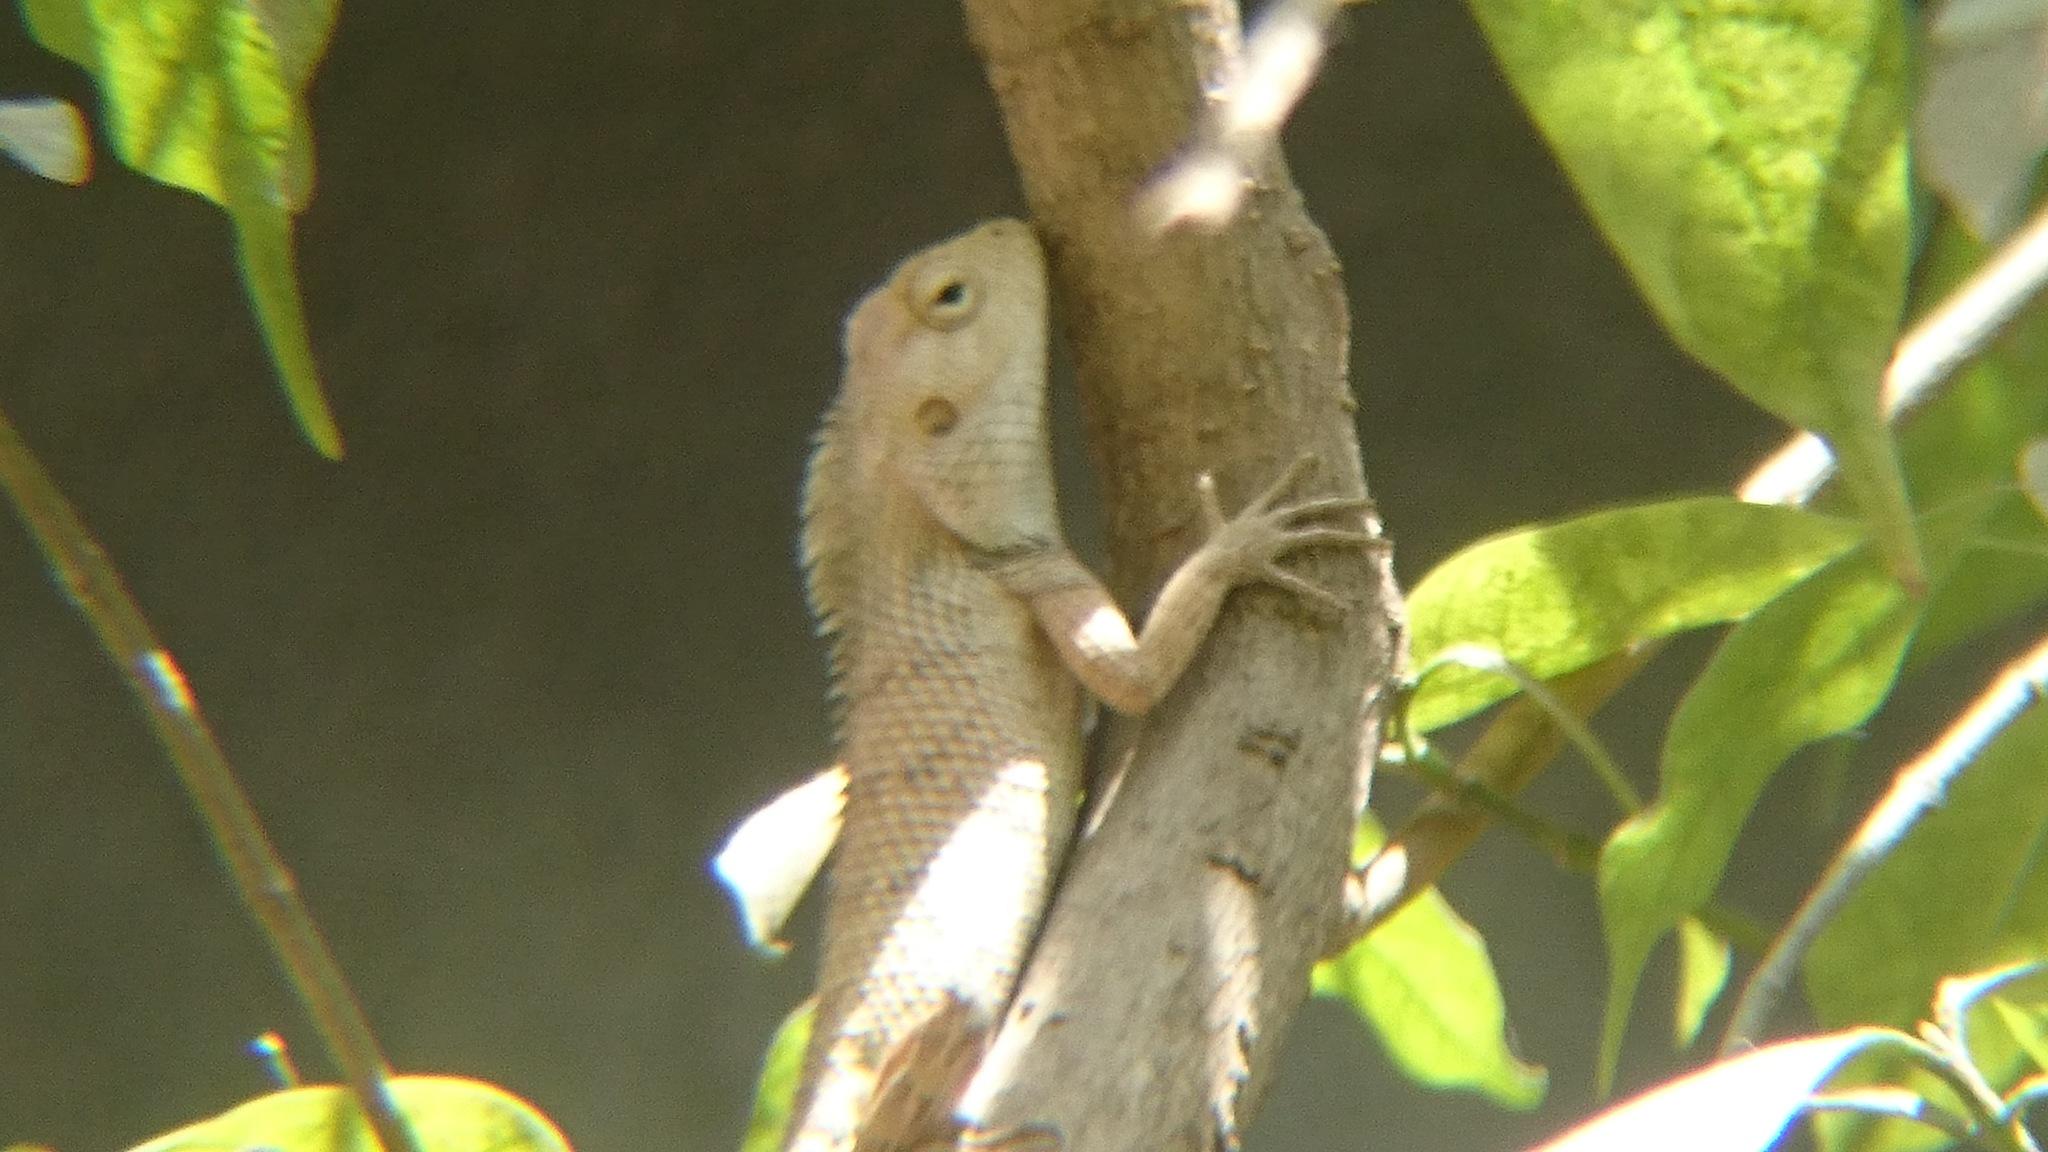 Chameleon  by Rajesh Khurana